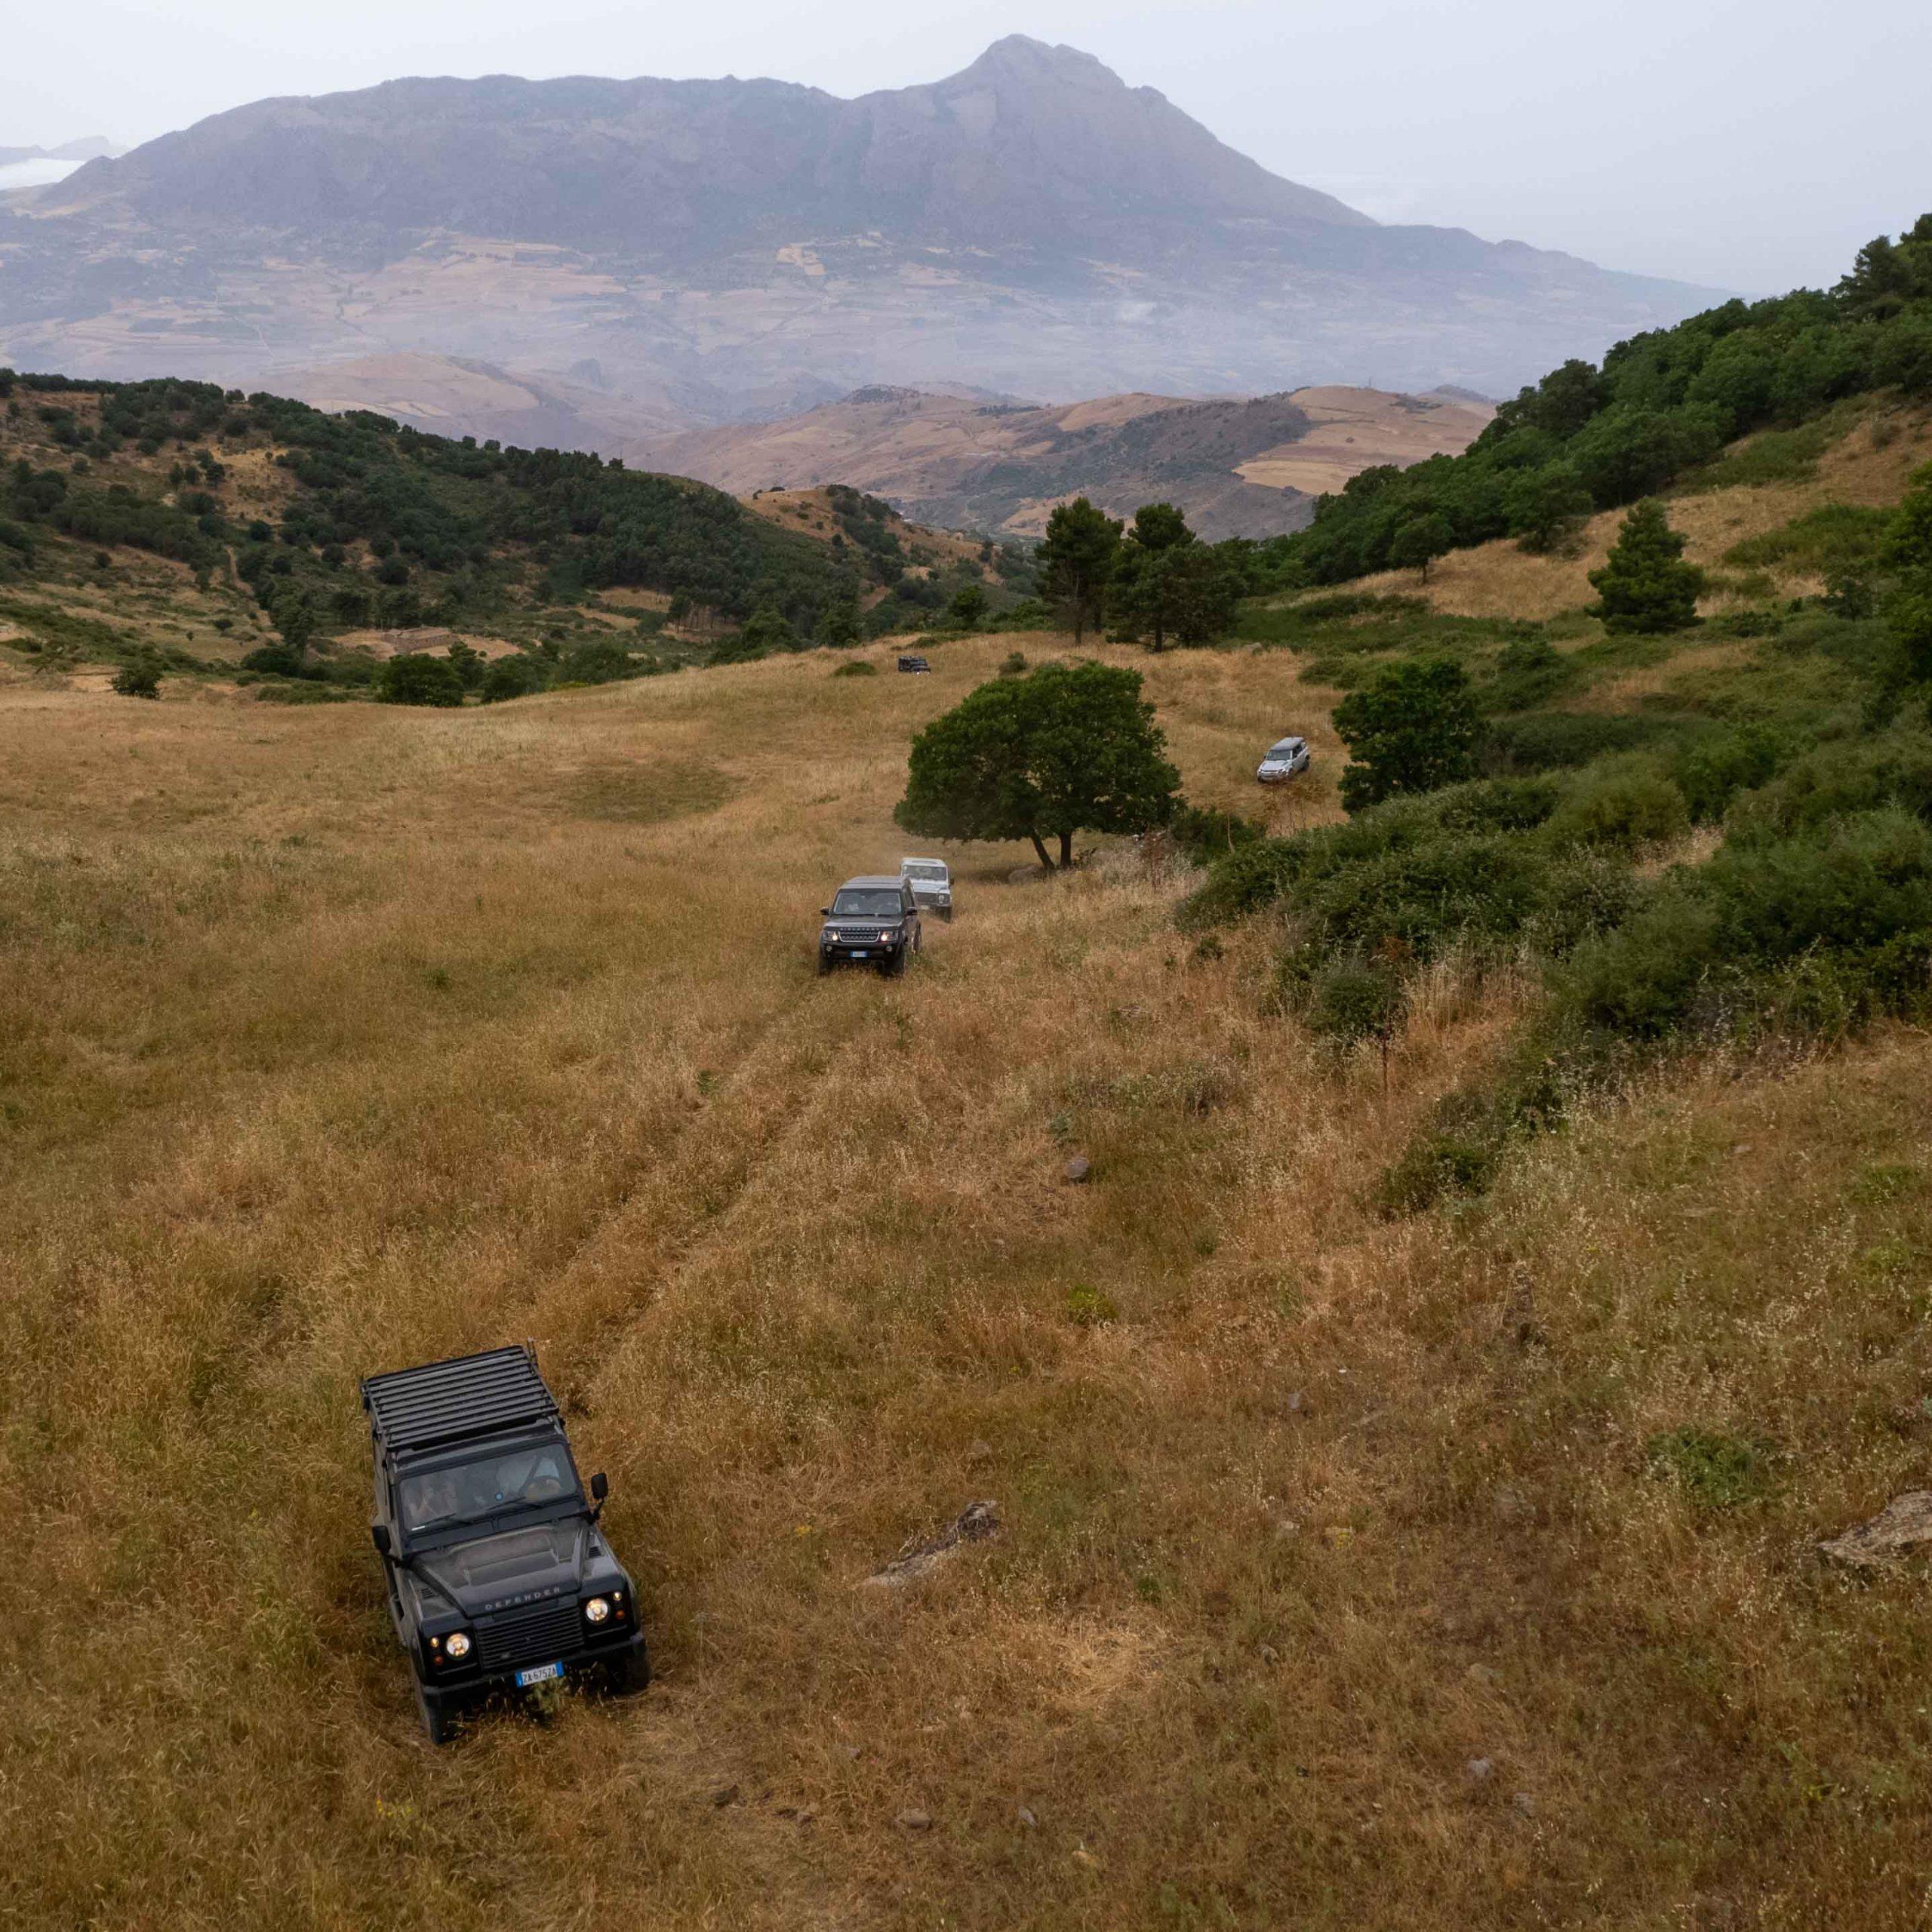 Land_Rover_Tour_Sicilia_2021_Land_Rover_Experience_Italia_-45